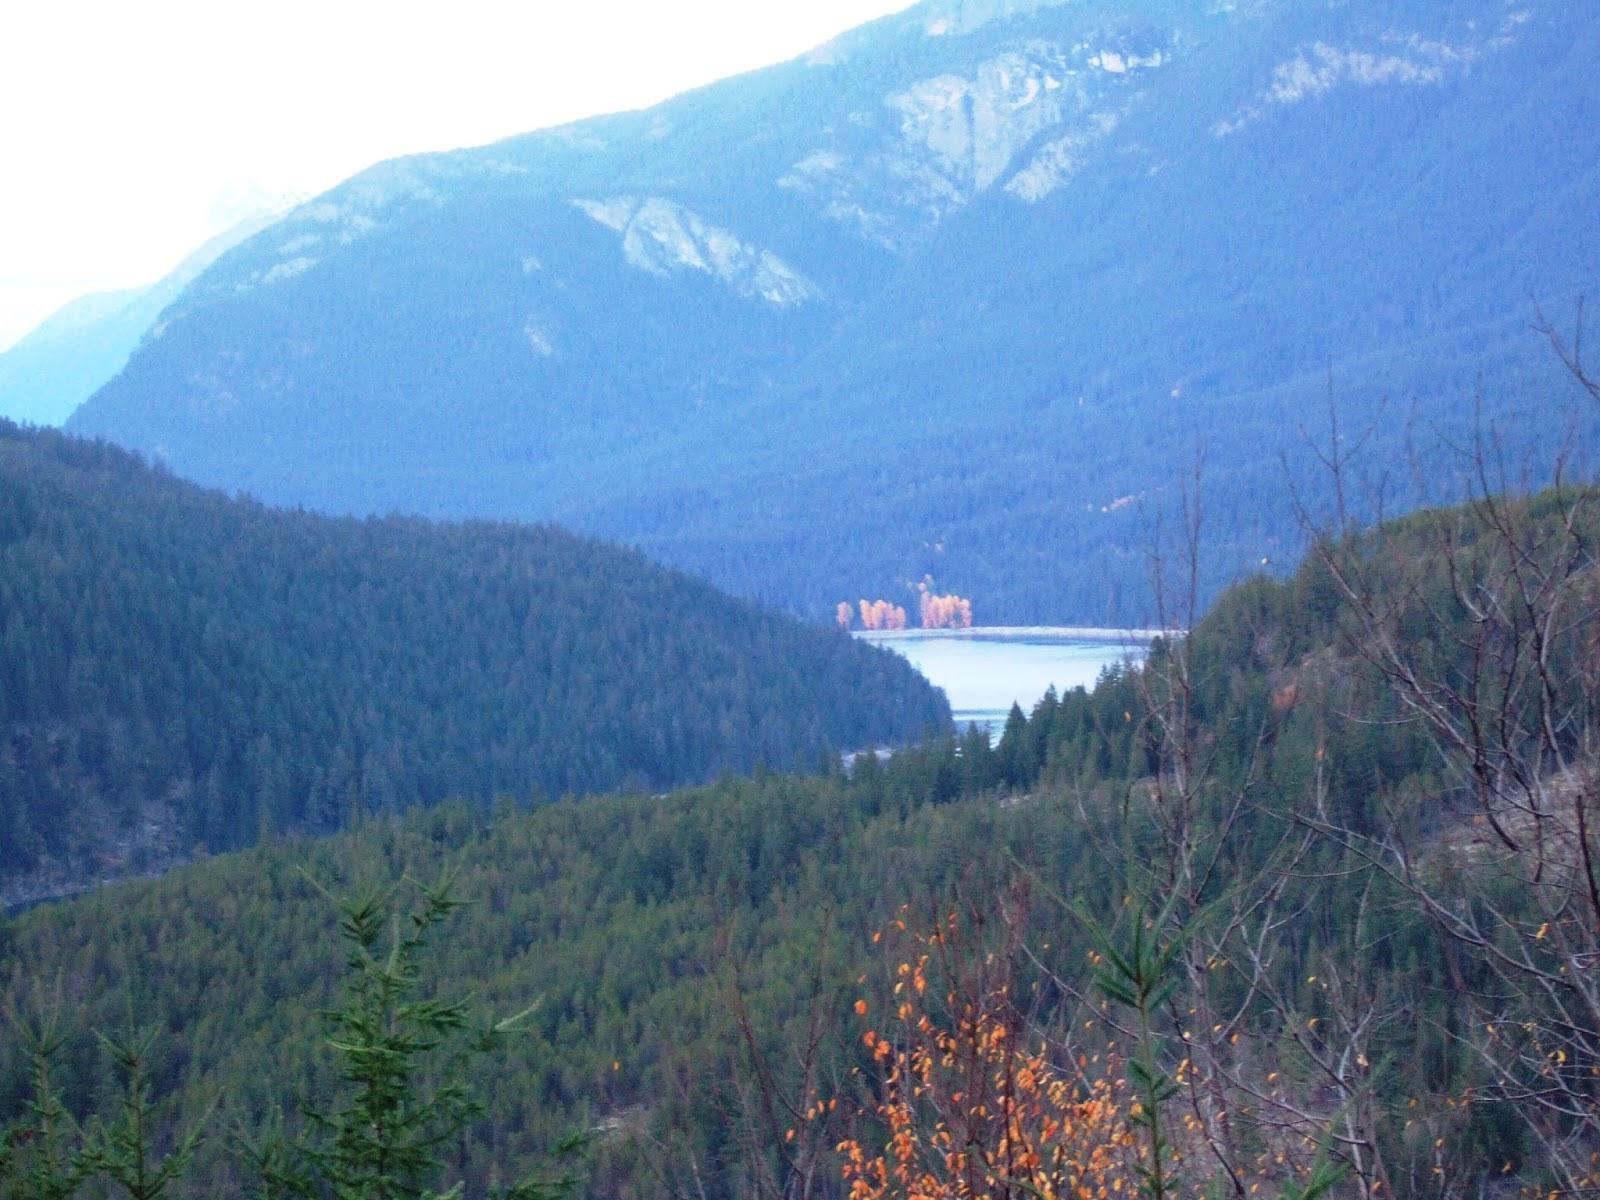 From wild birds to beet seeds, the Skagit Valley's riches ... |Upper Skagit Valley